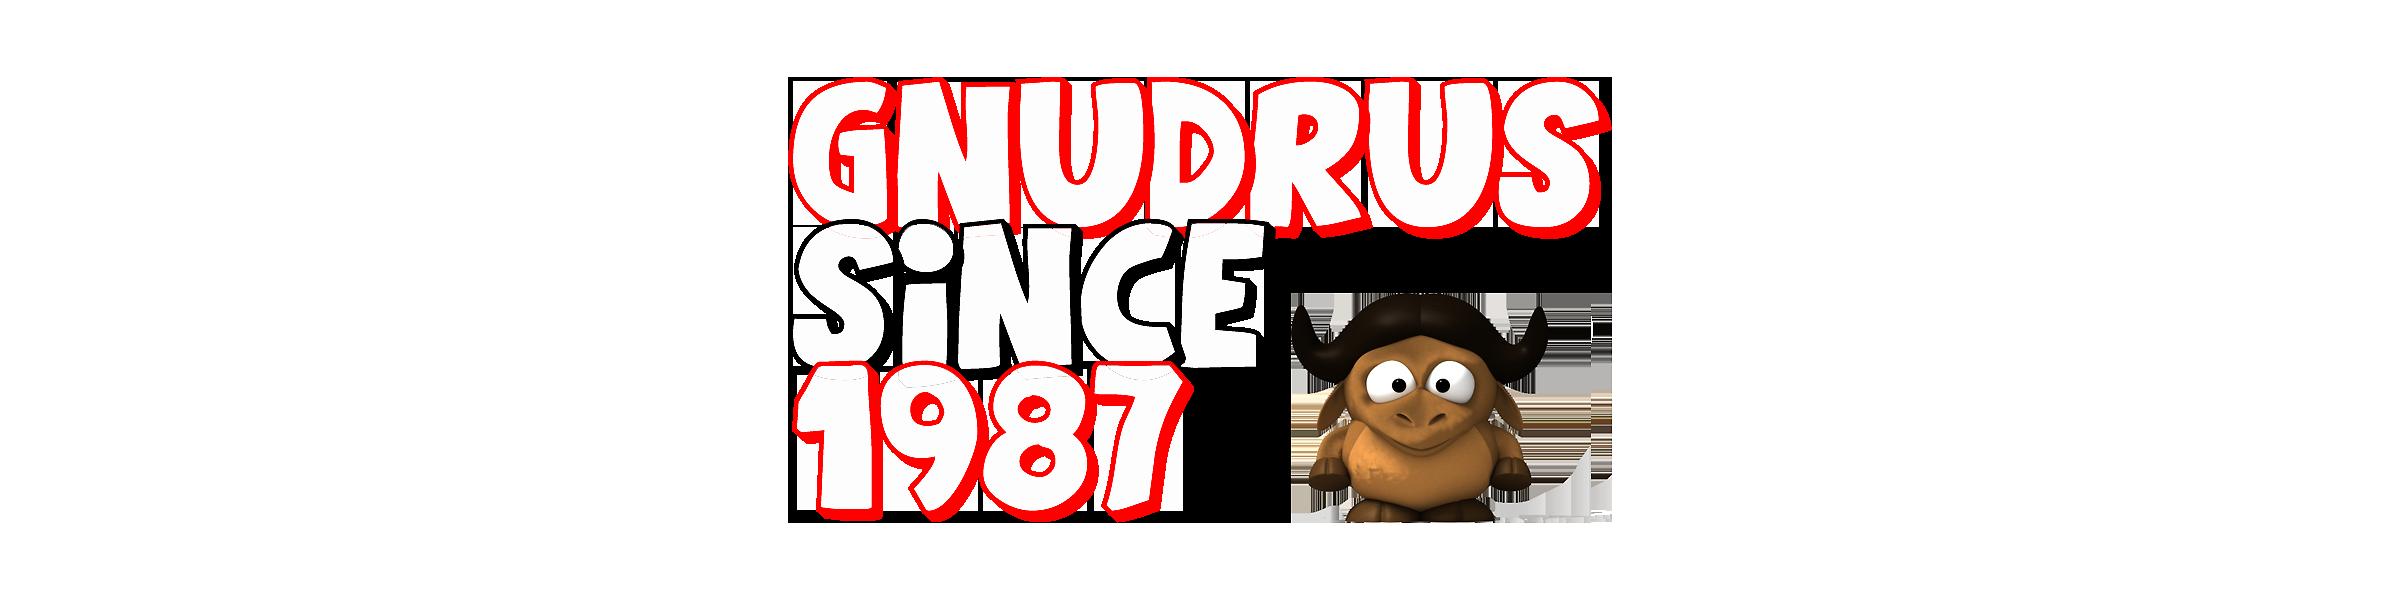 Gnudrus Shop Redbubble